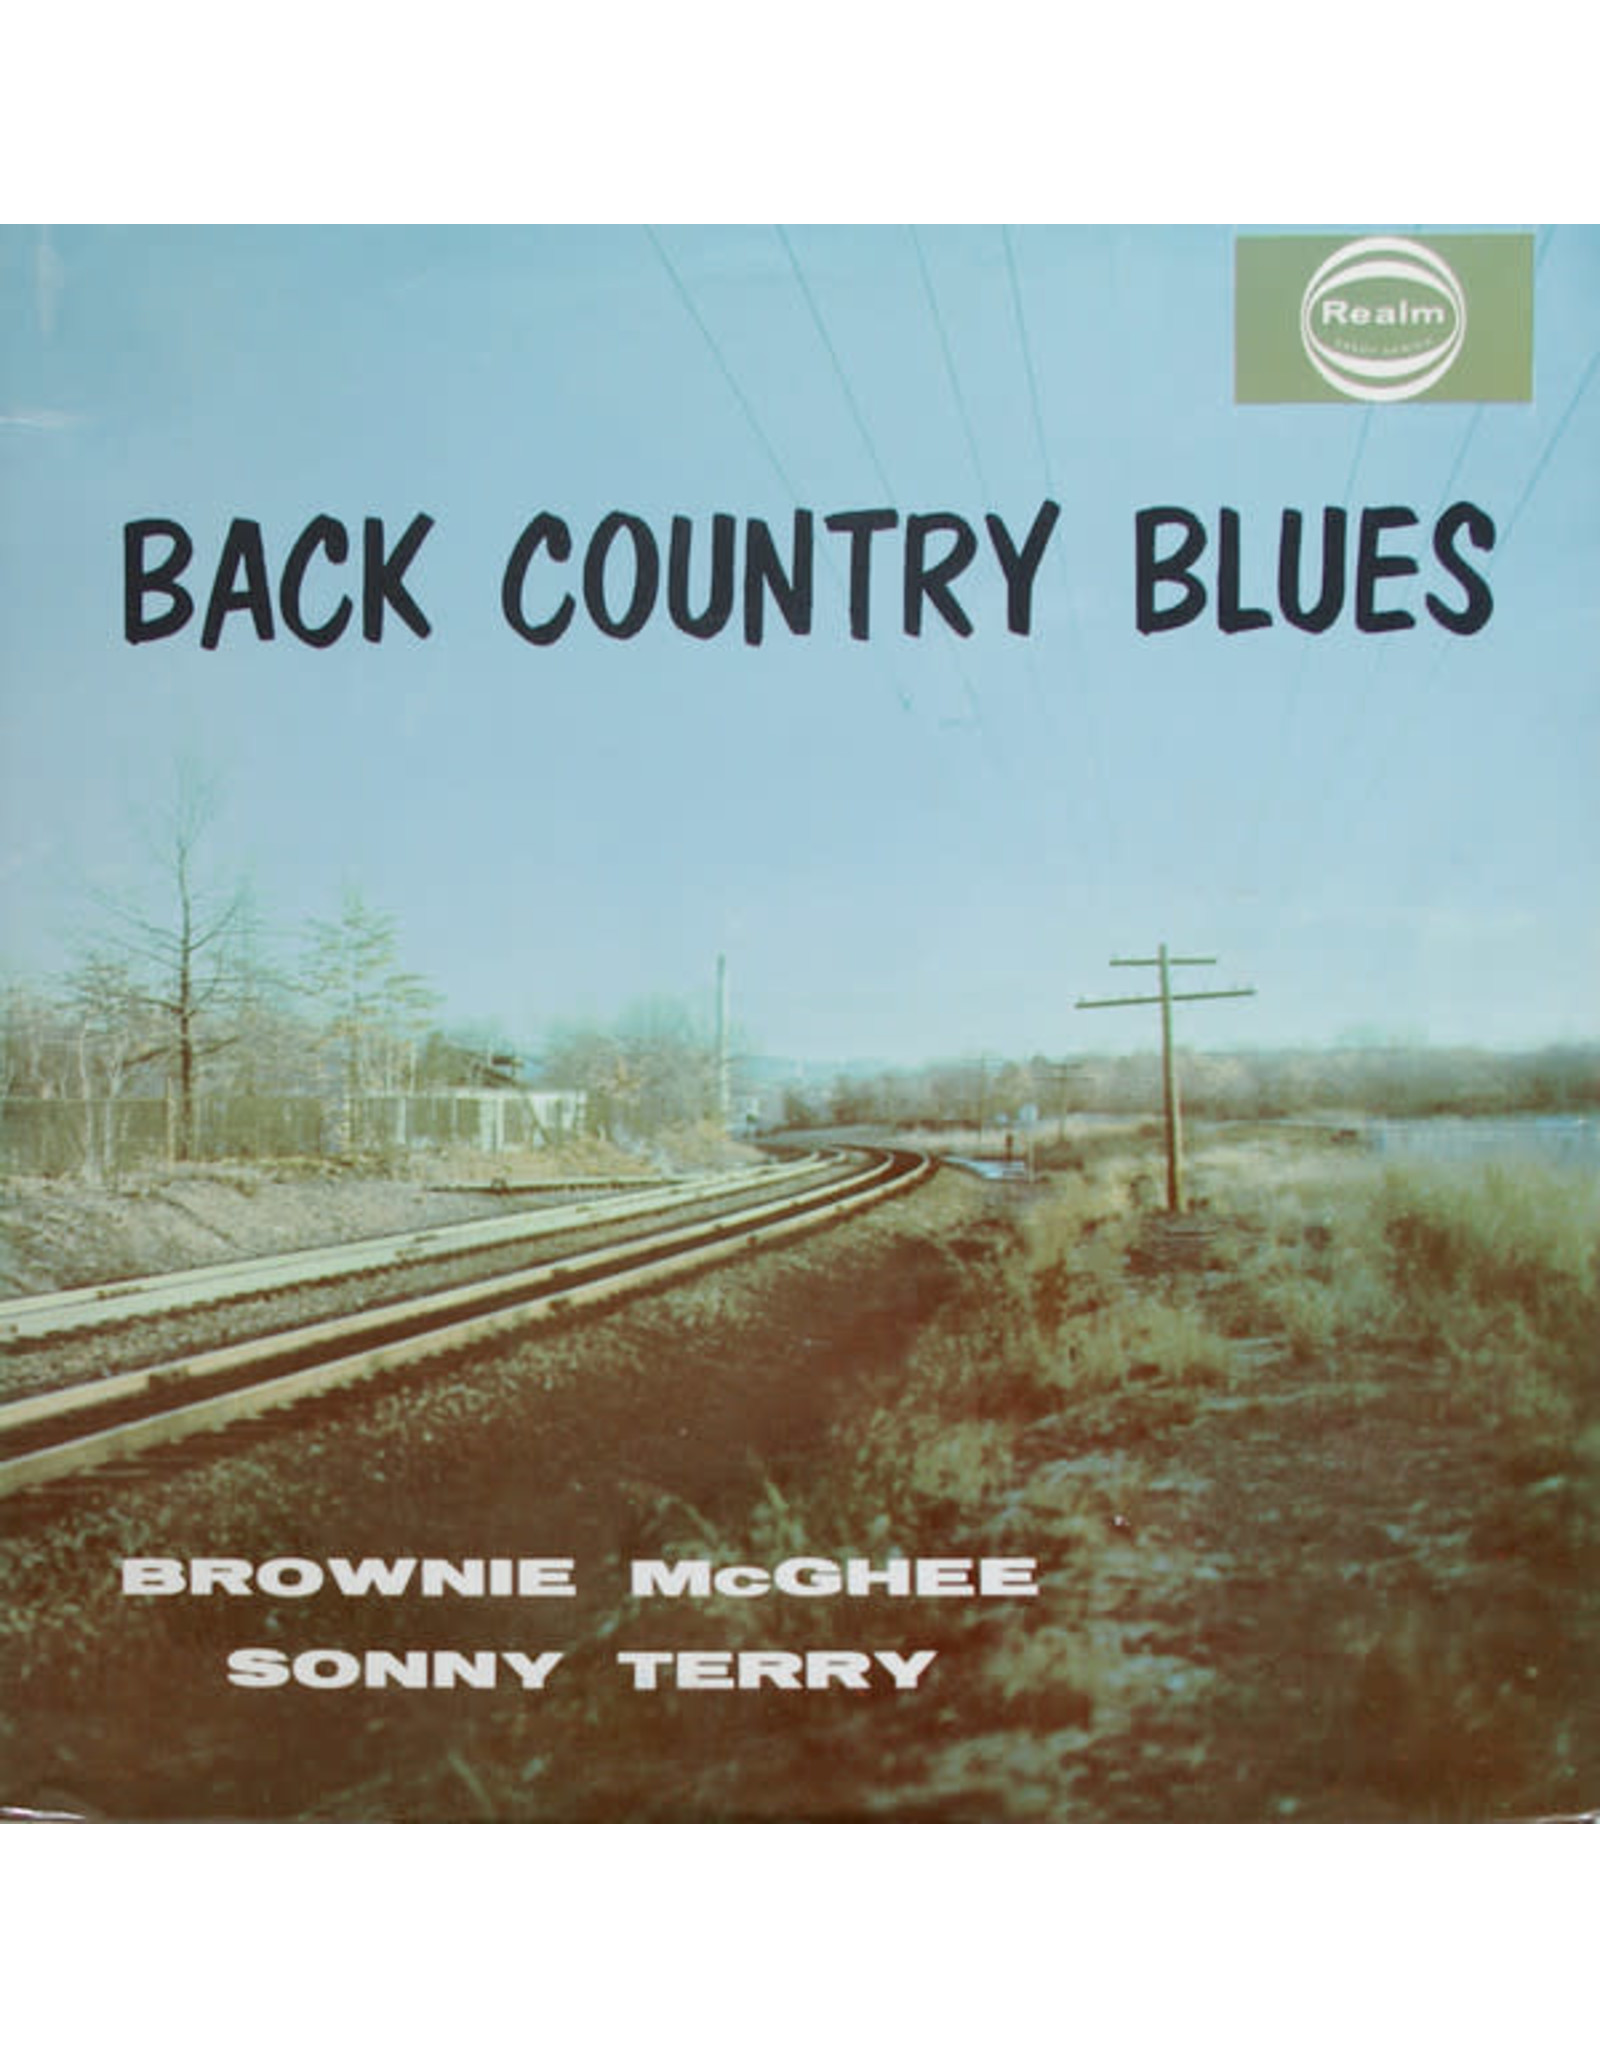 New Vinyl Brownie Mcghee / Sonny Terry - Back Country Blues LP